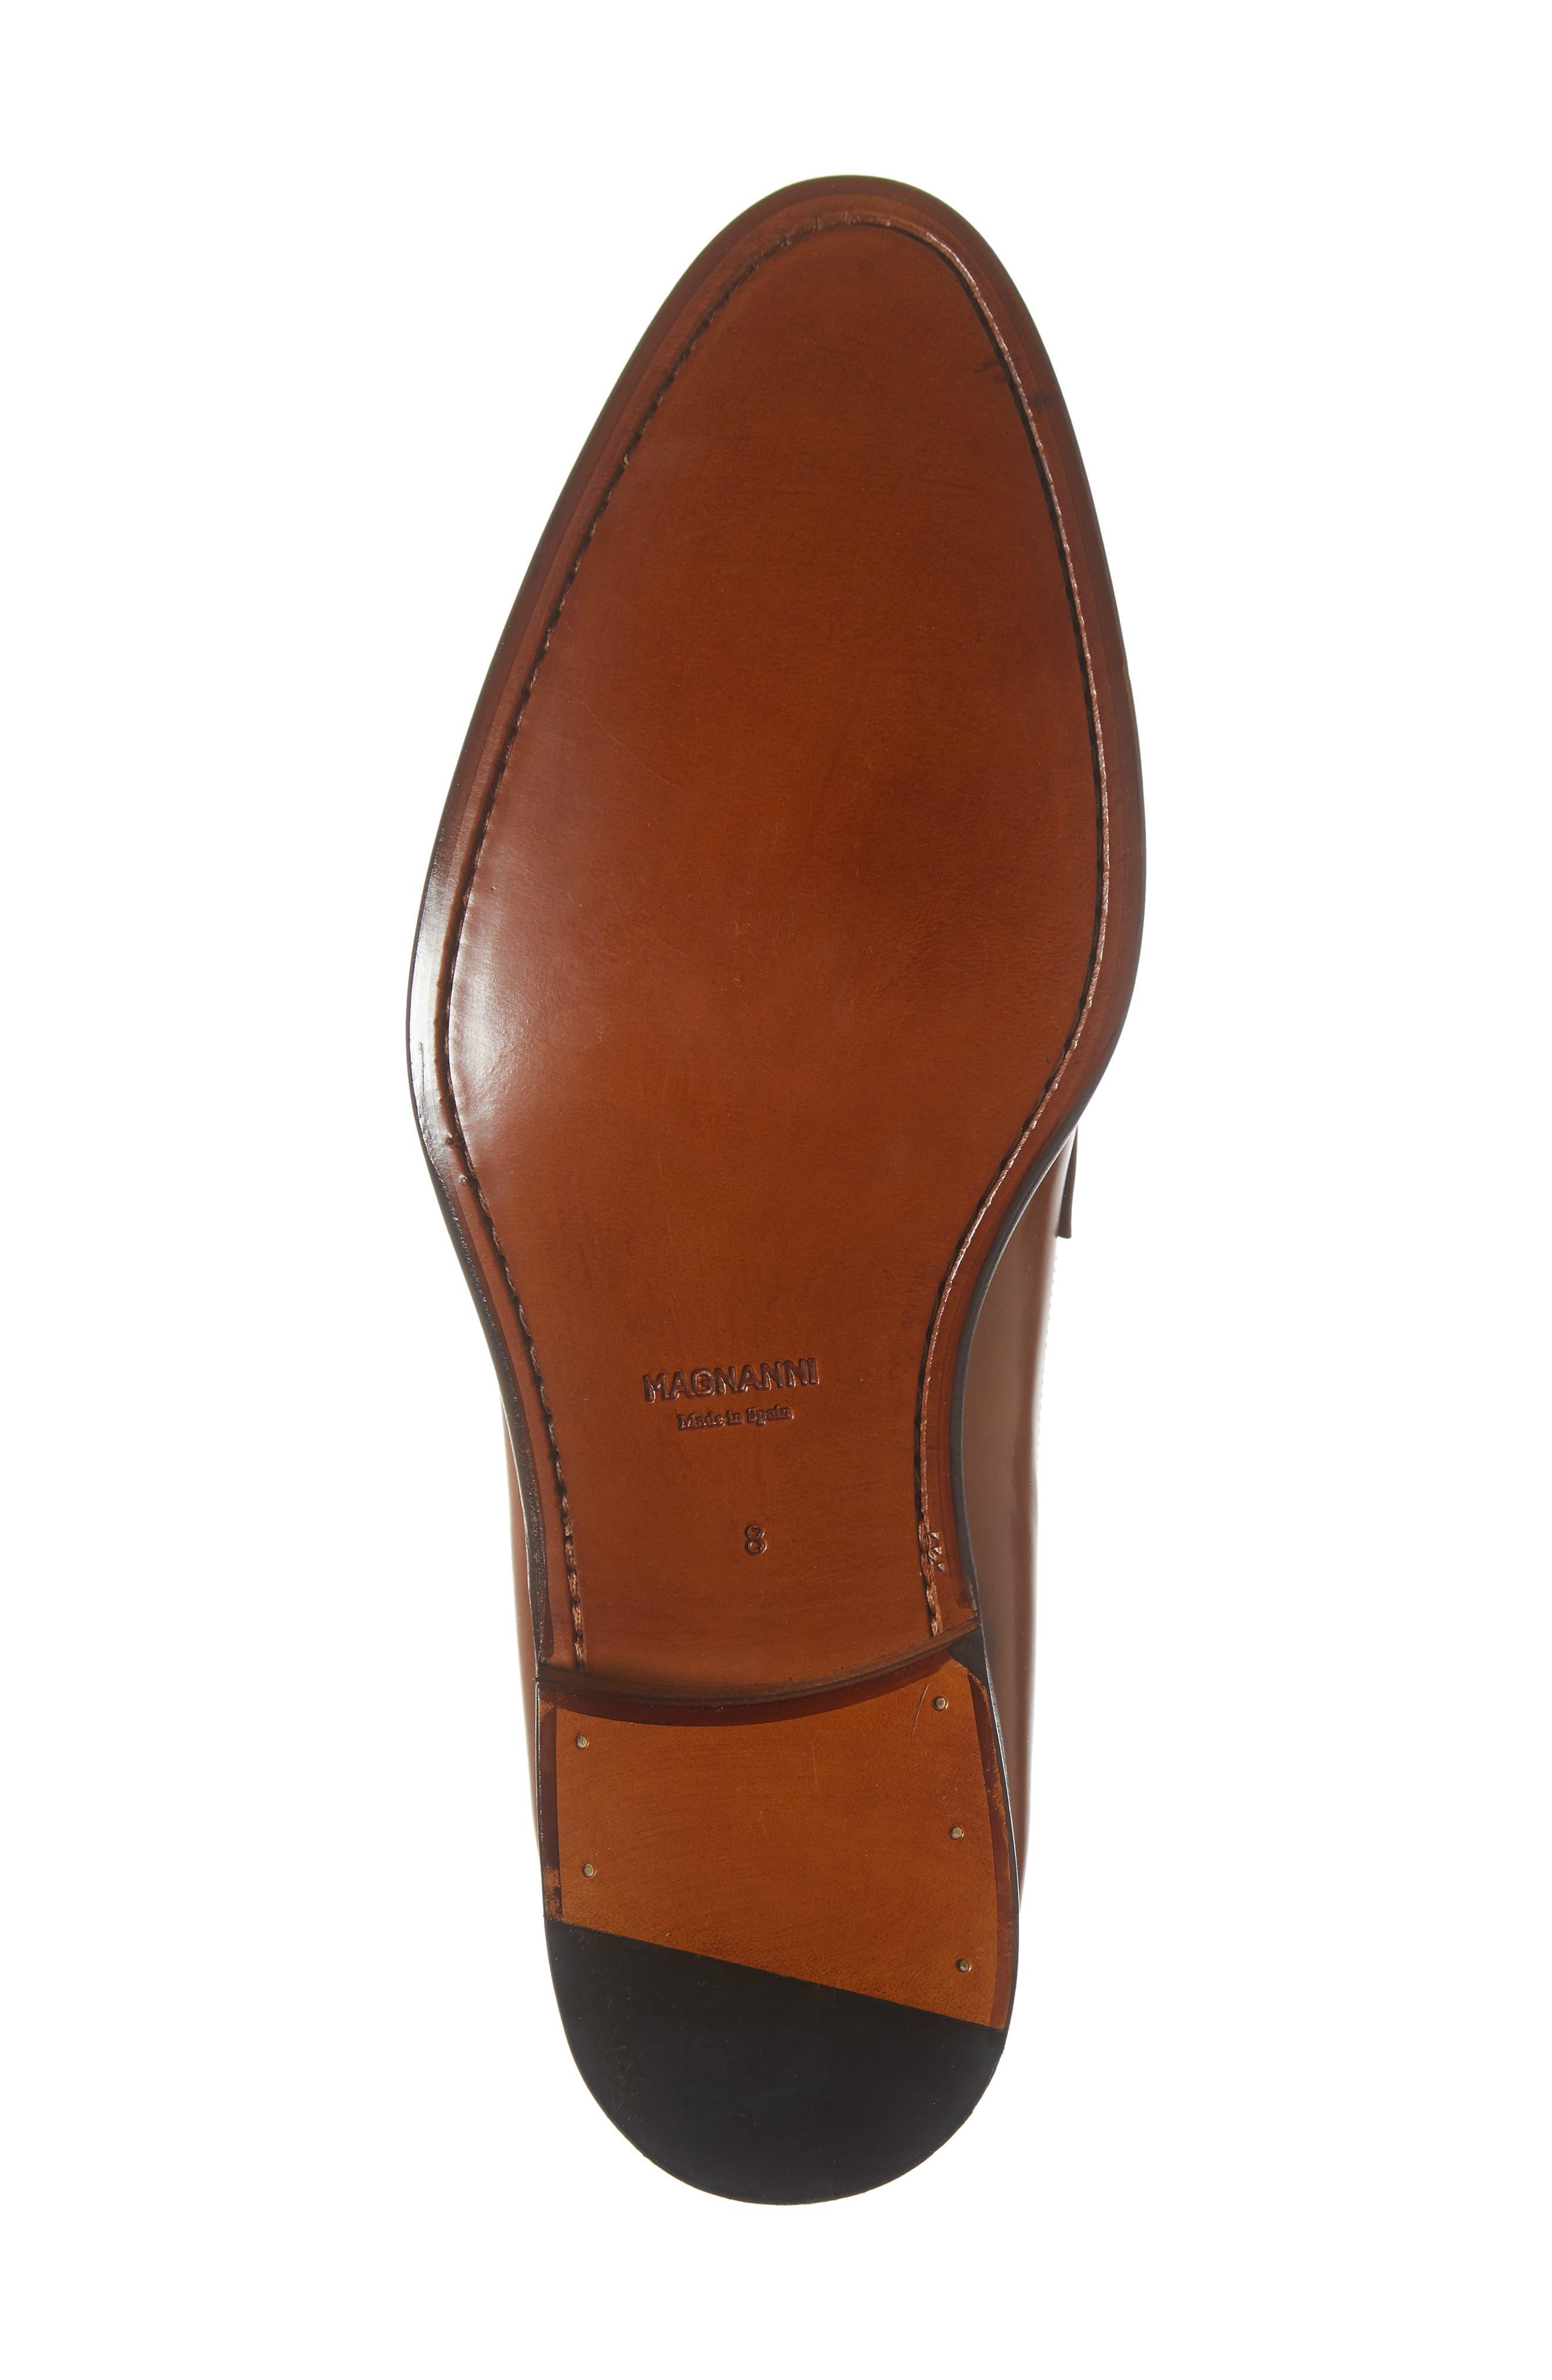 Valda Double Strap Cap Toe Monk Shoe,                             Alternate thumbnail 6, color,                             BROWN LEATHER